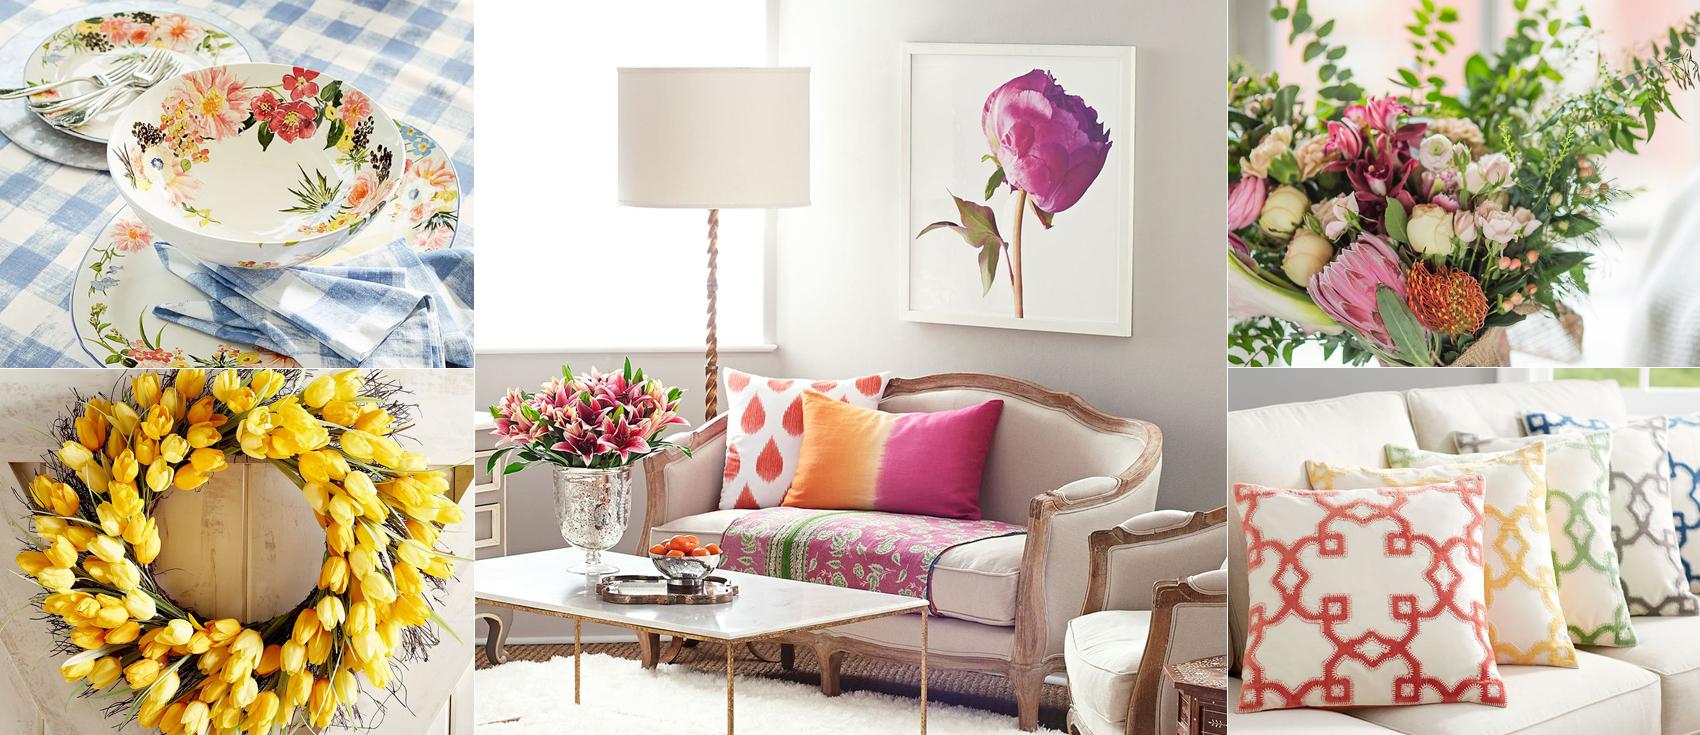 Spring Decor | Spring Decorating Ideas